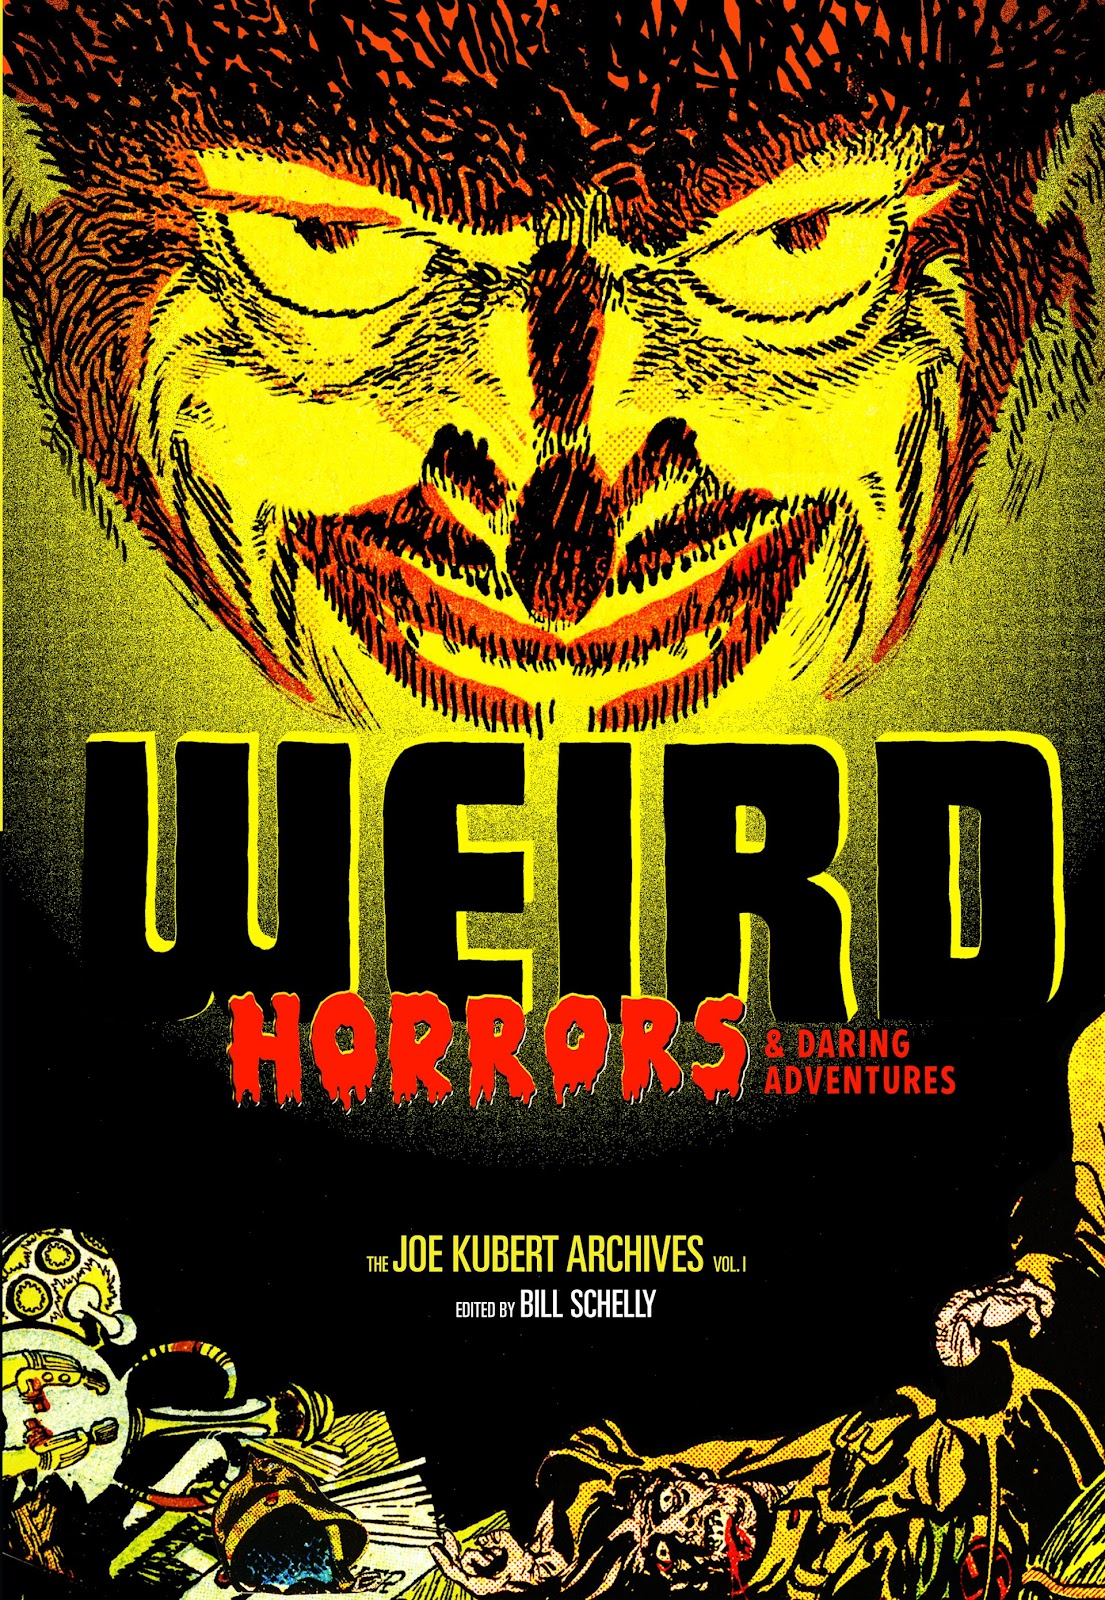 Read online The Joe Kubert Archives comic -  Issue # TPB (Part 1) - 1